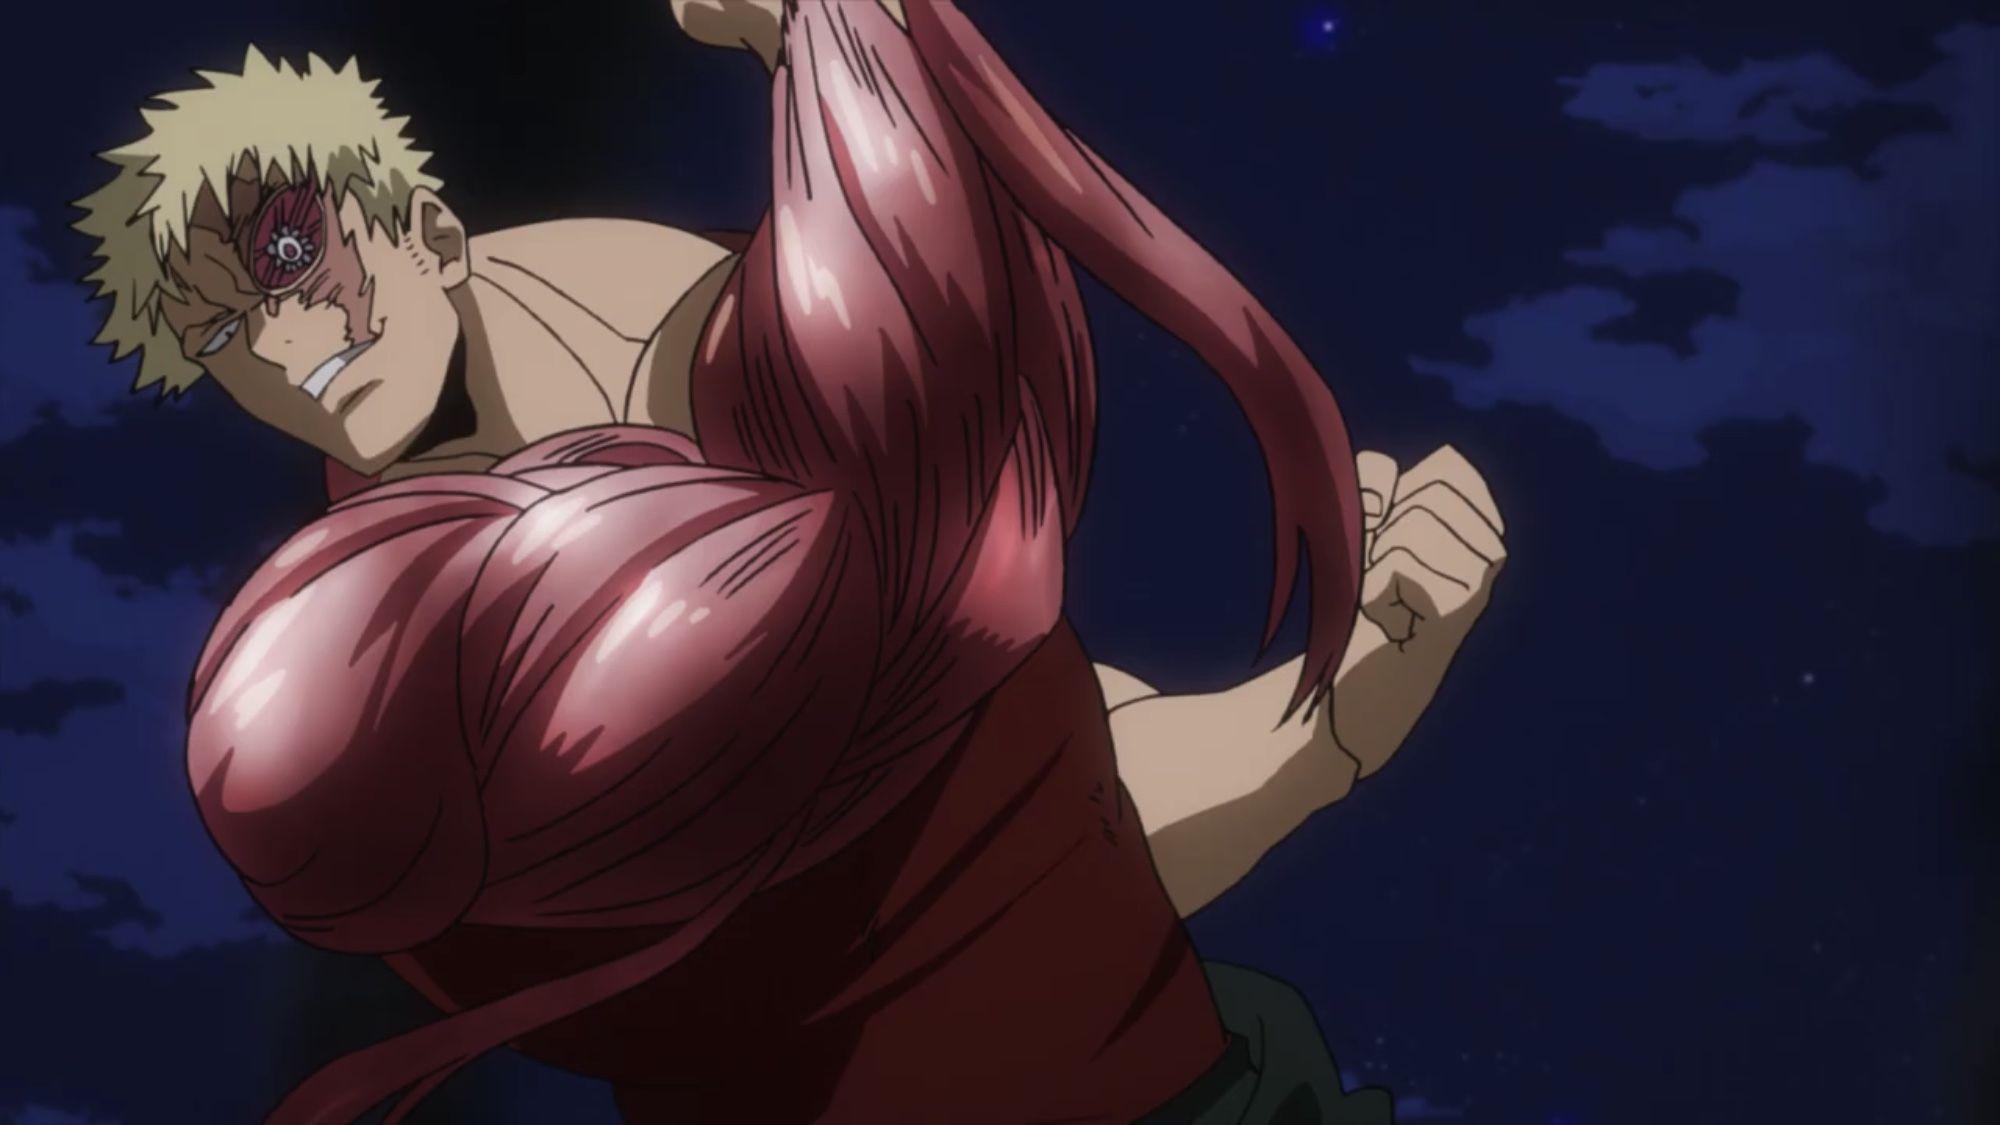 Muscular Boku No Hero Academia Hero My Hero Academia Boku No Hero Academia